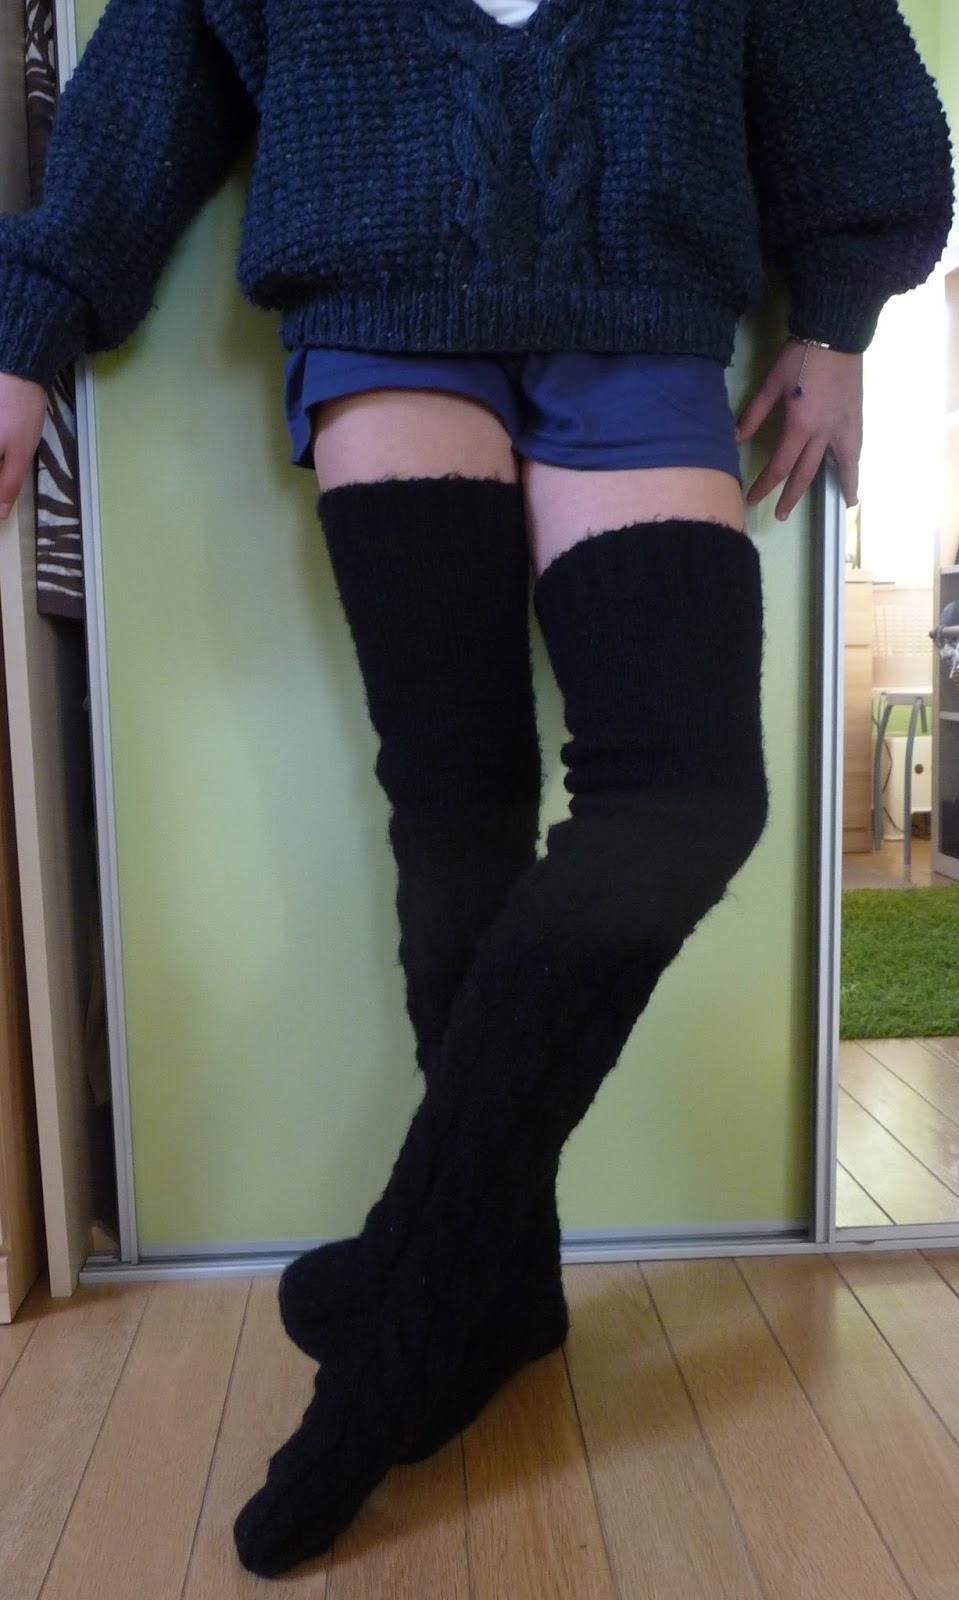 c6ca27fe7c095 Ręko-czyny: Robione na drutach pończochy na zimę - krok po kroku